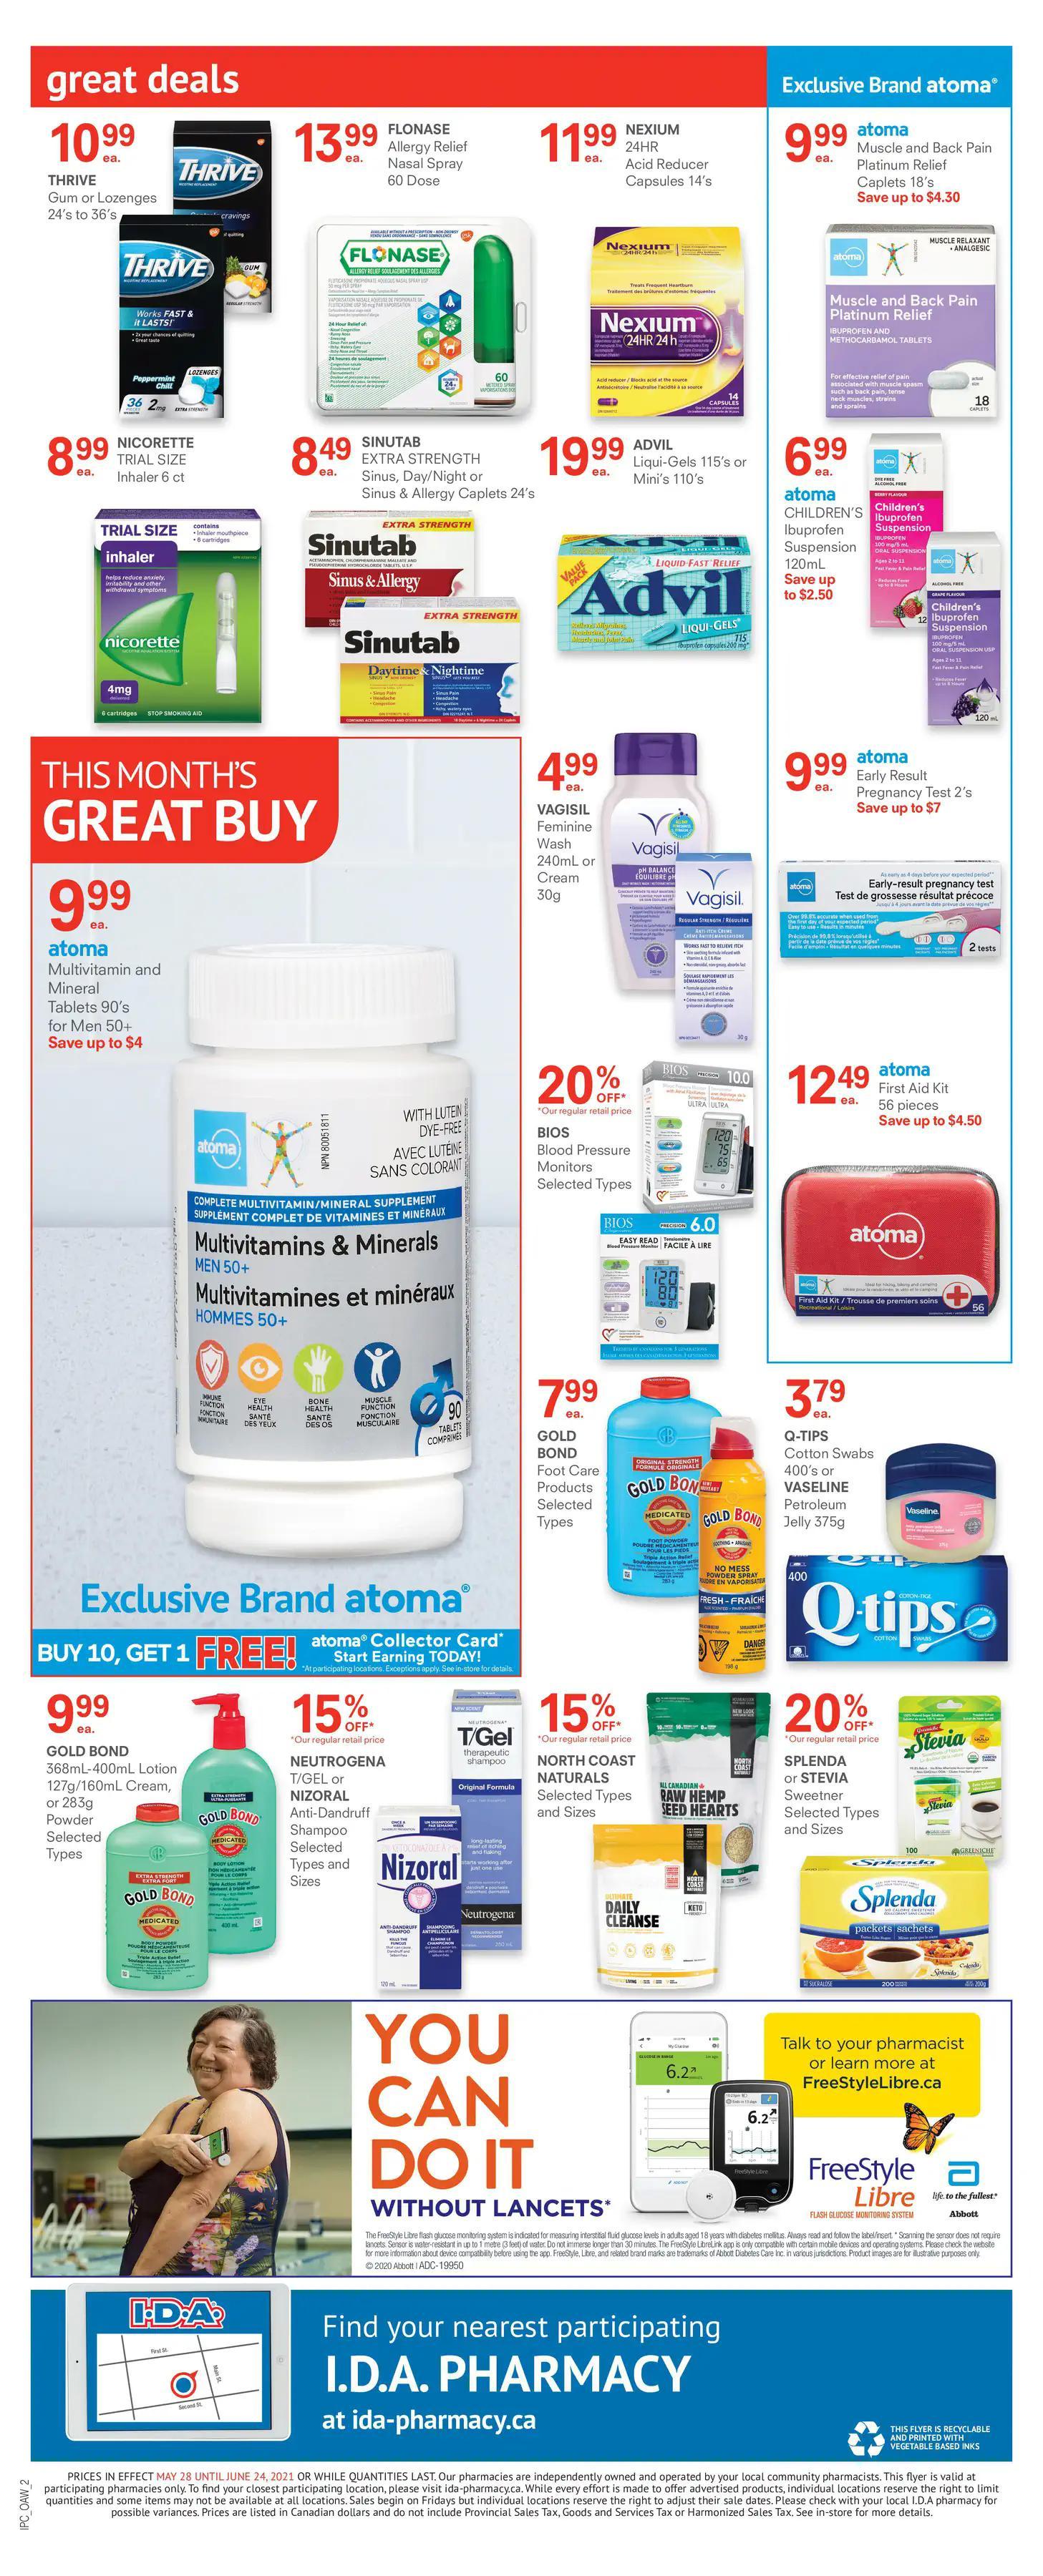 Guardian IDA Pharmacies - Monthly Savings - Page 3